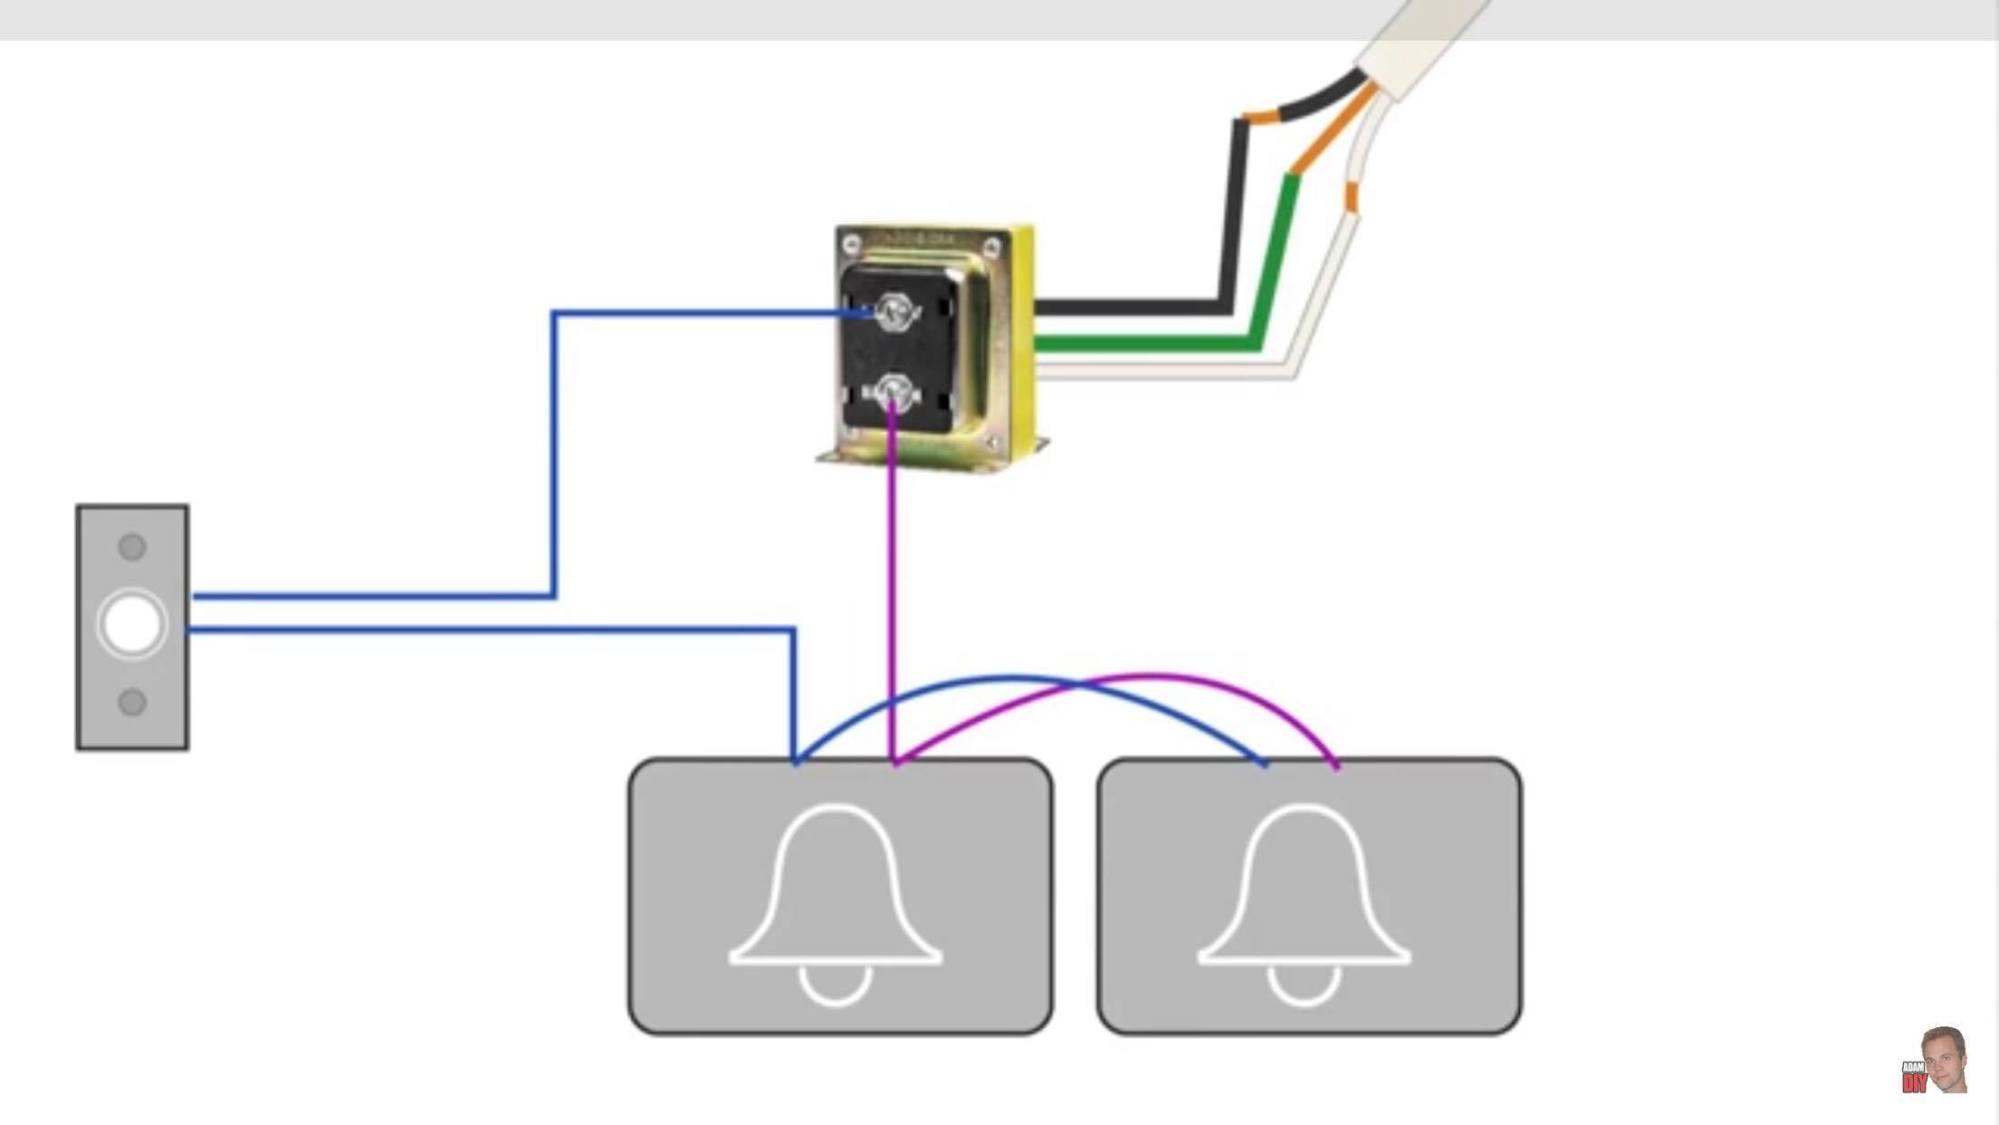 hight resolution of bathroom wiring help doityourselfcom community forums wiring way bathroom fan wiring help doityourselfcom community forums